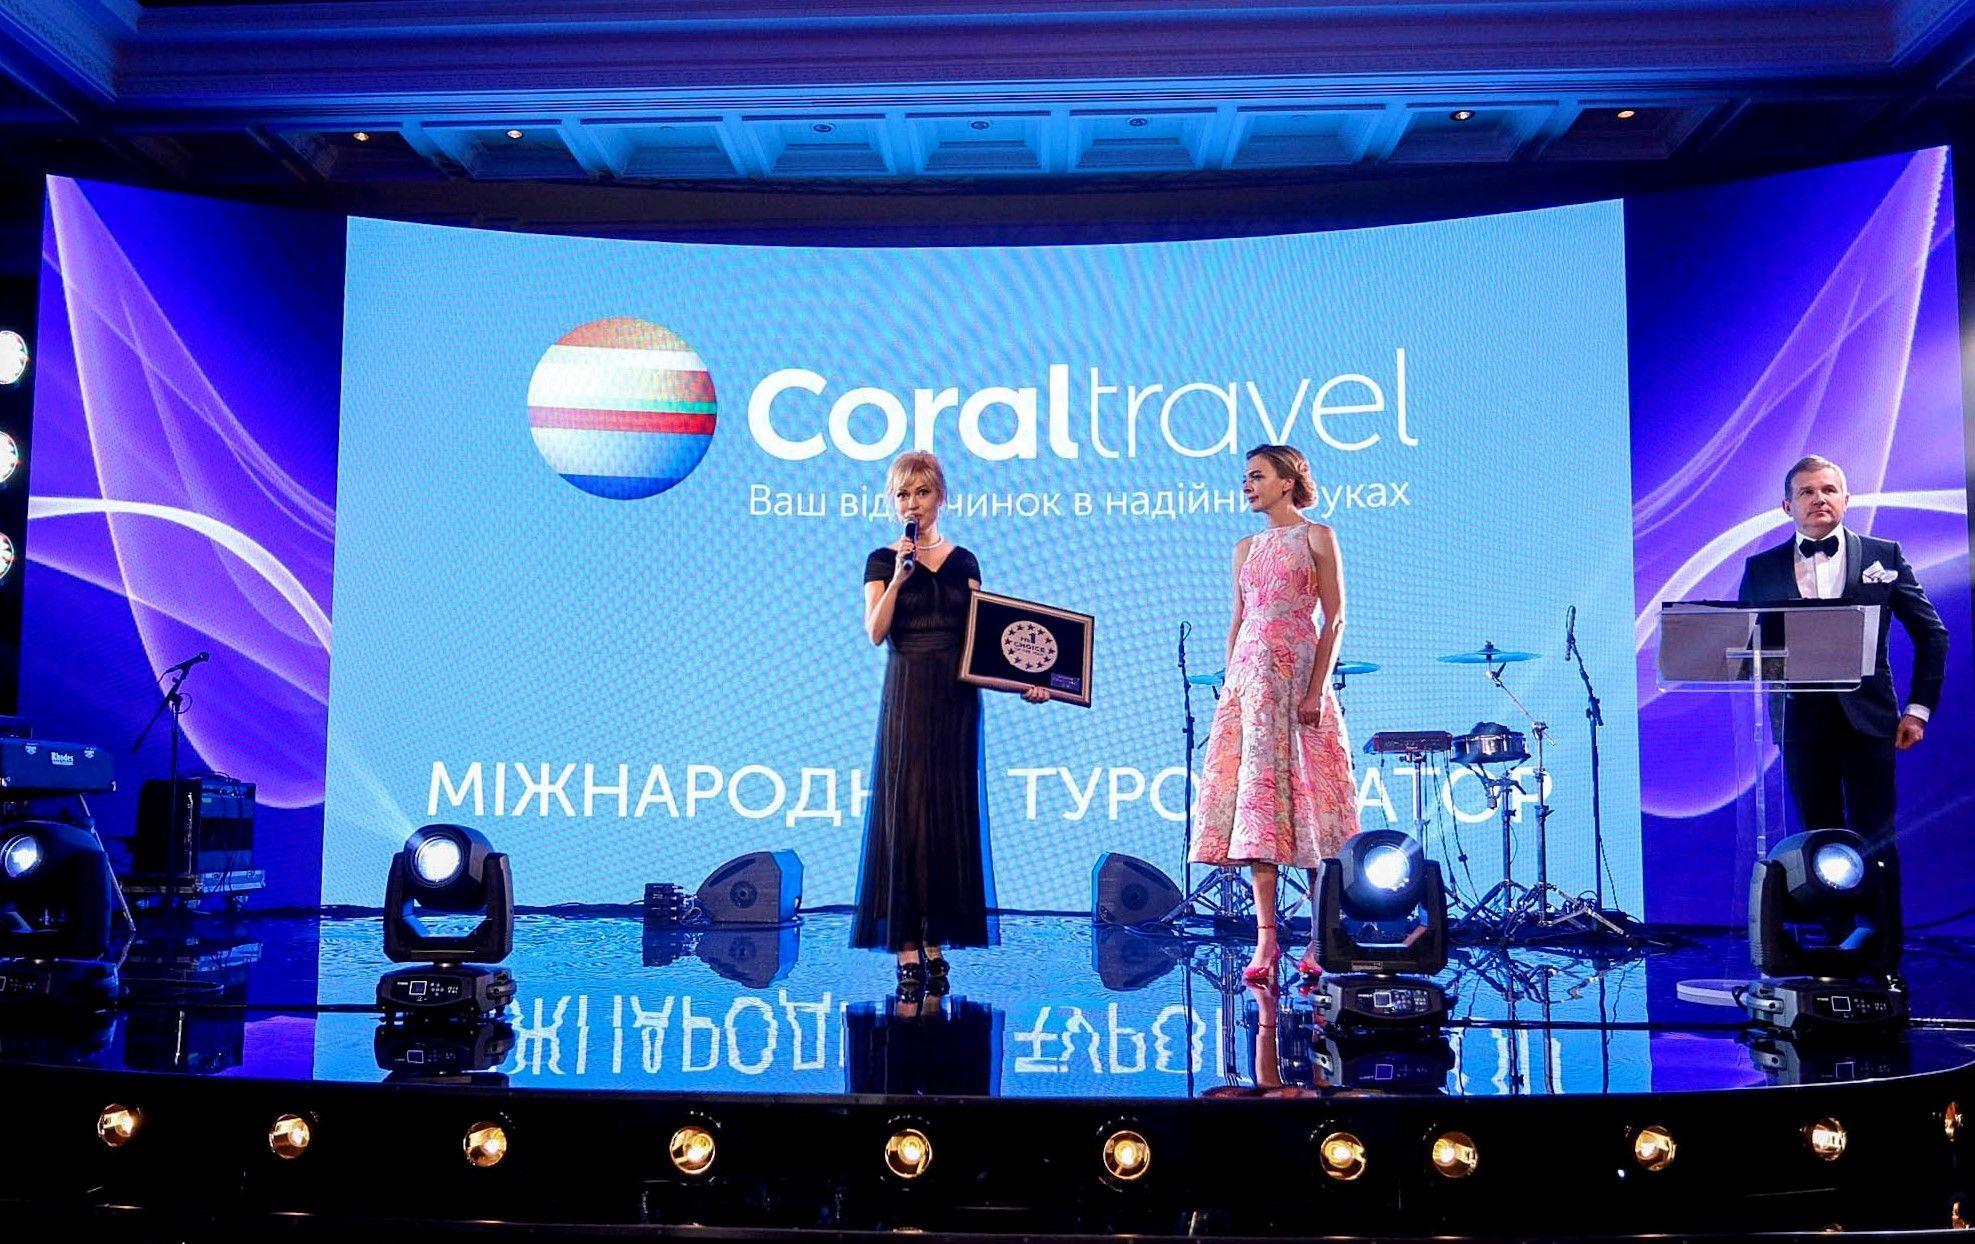 Coral Travel_реклама_3